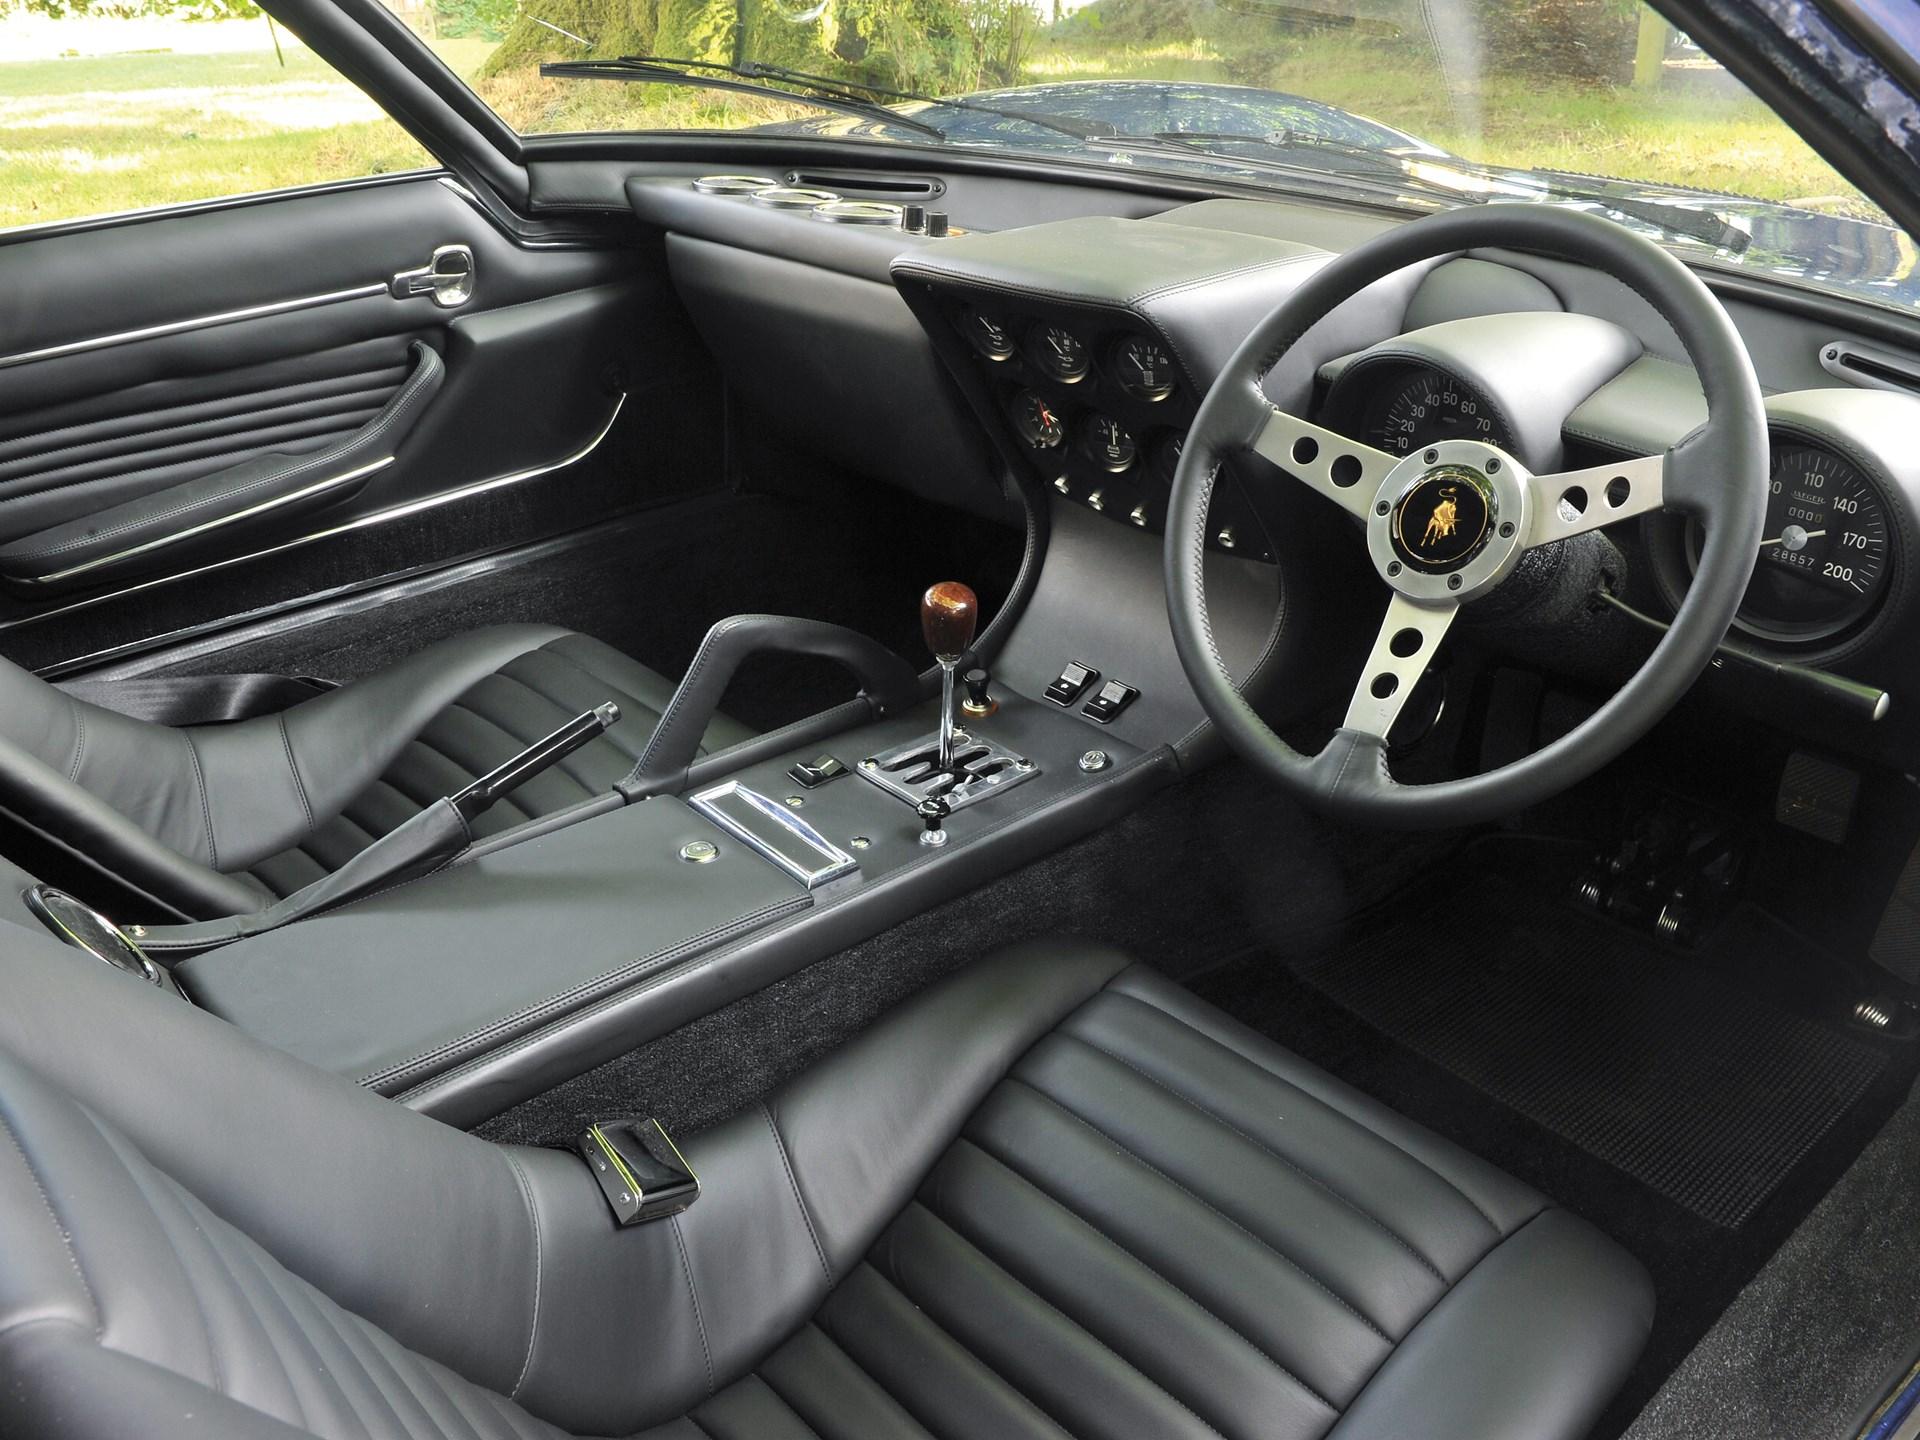 Rm Sotheby S 1971 Lamborghini Miura P400 S Sv Specification